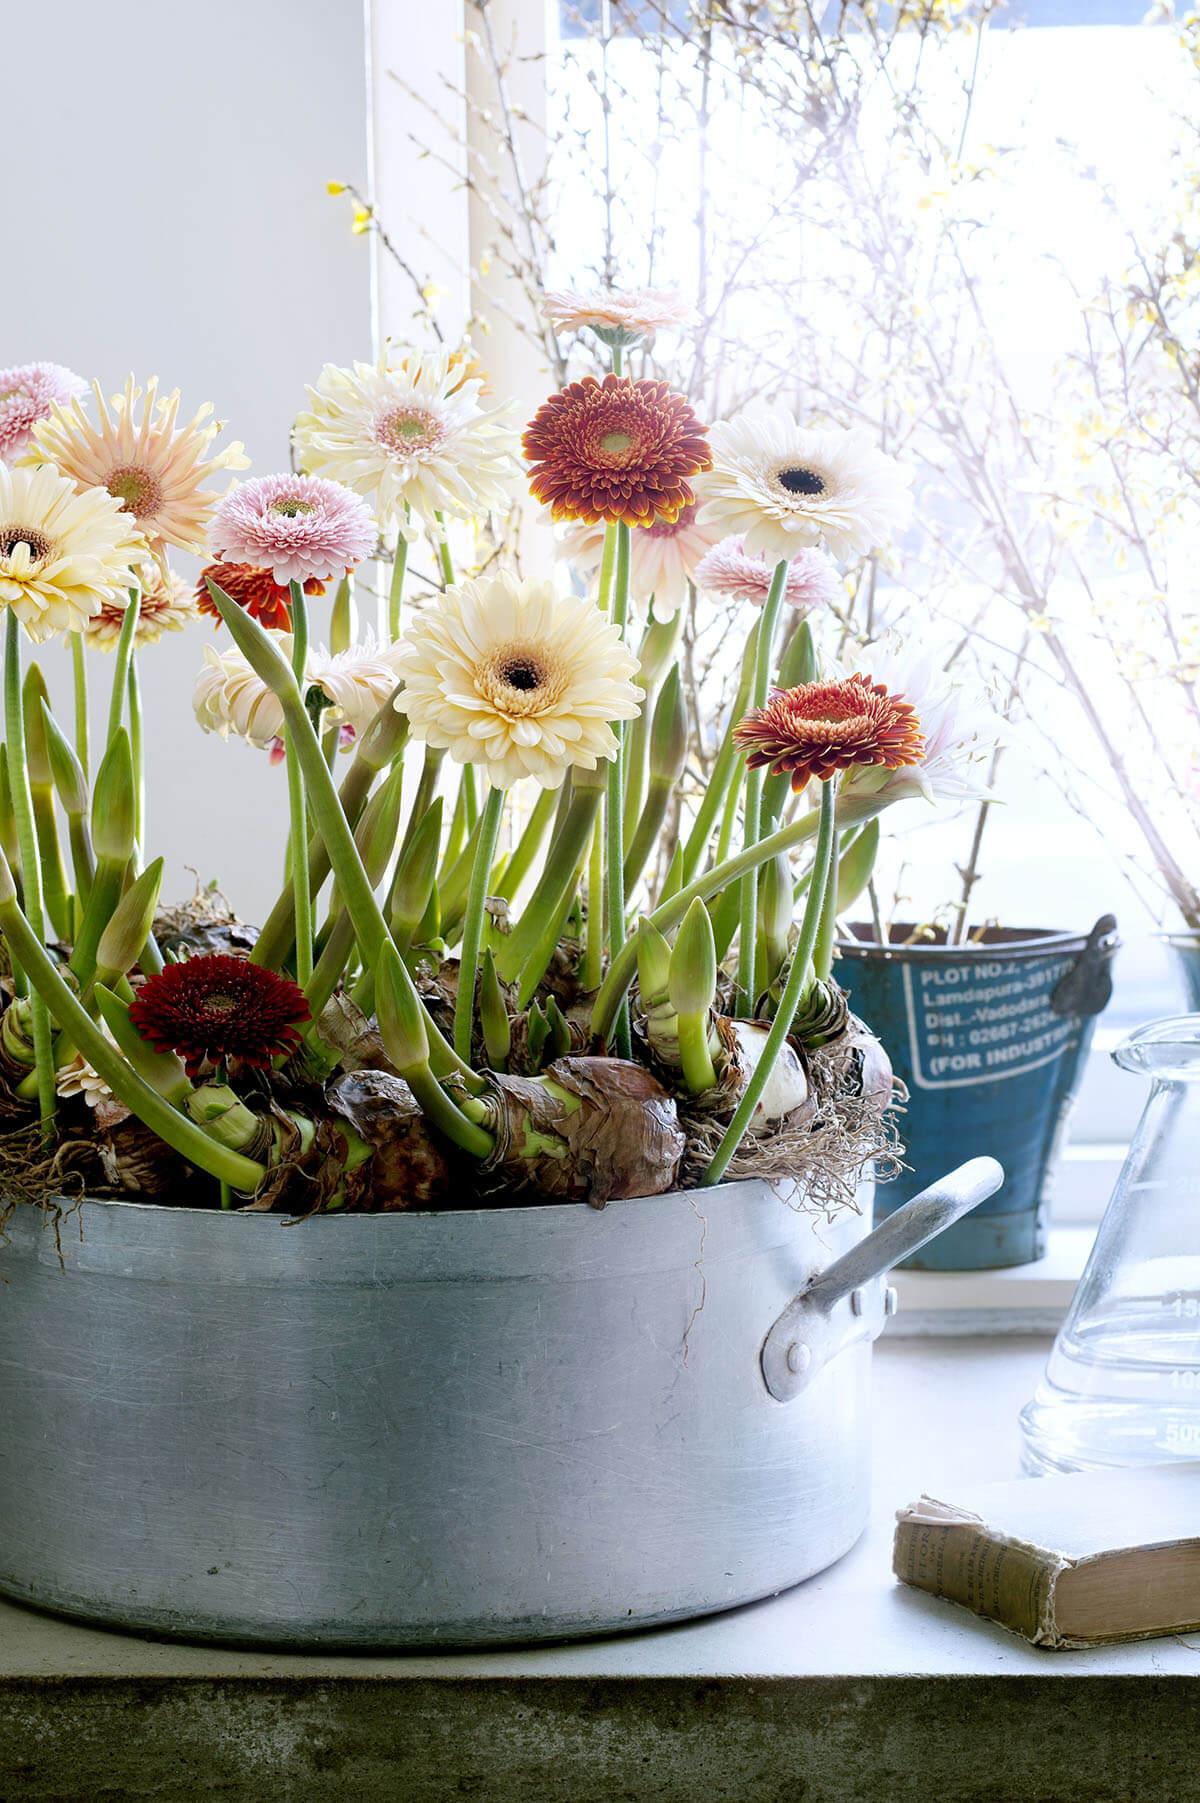 Цветы в кастрюле